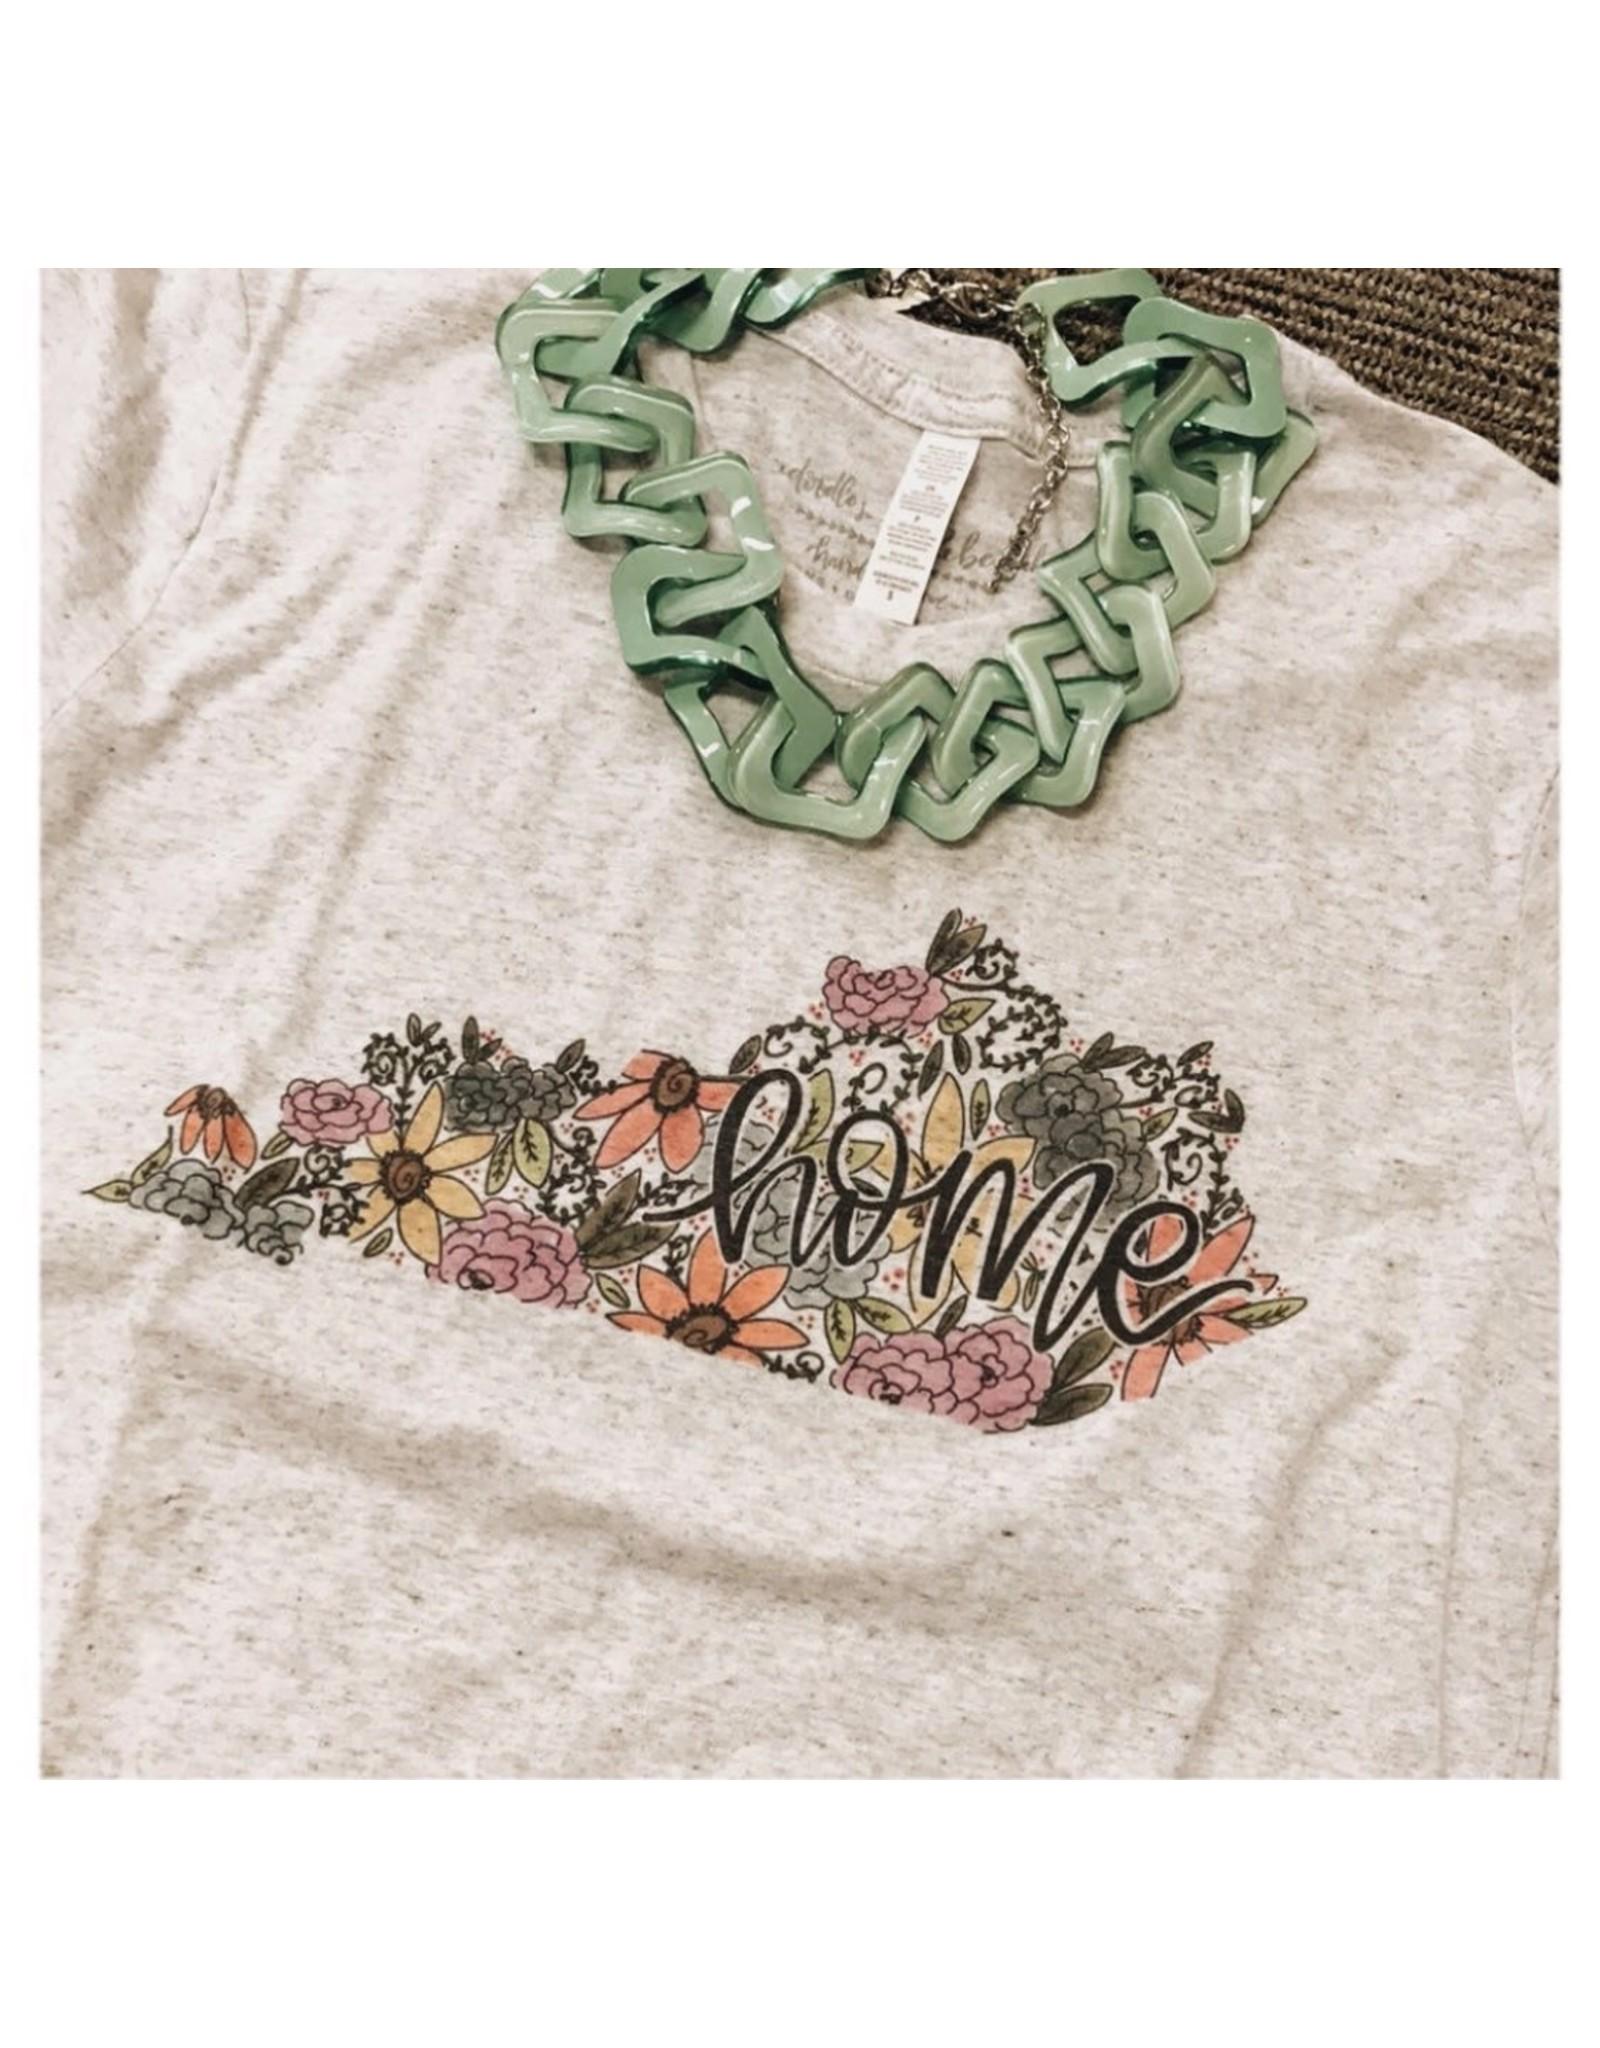 Kentucky Floral short sleeve tee (xlarge)